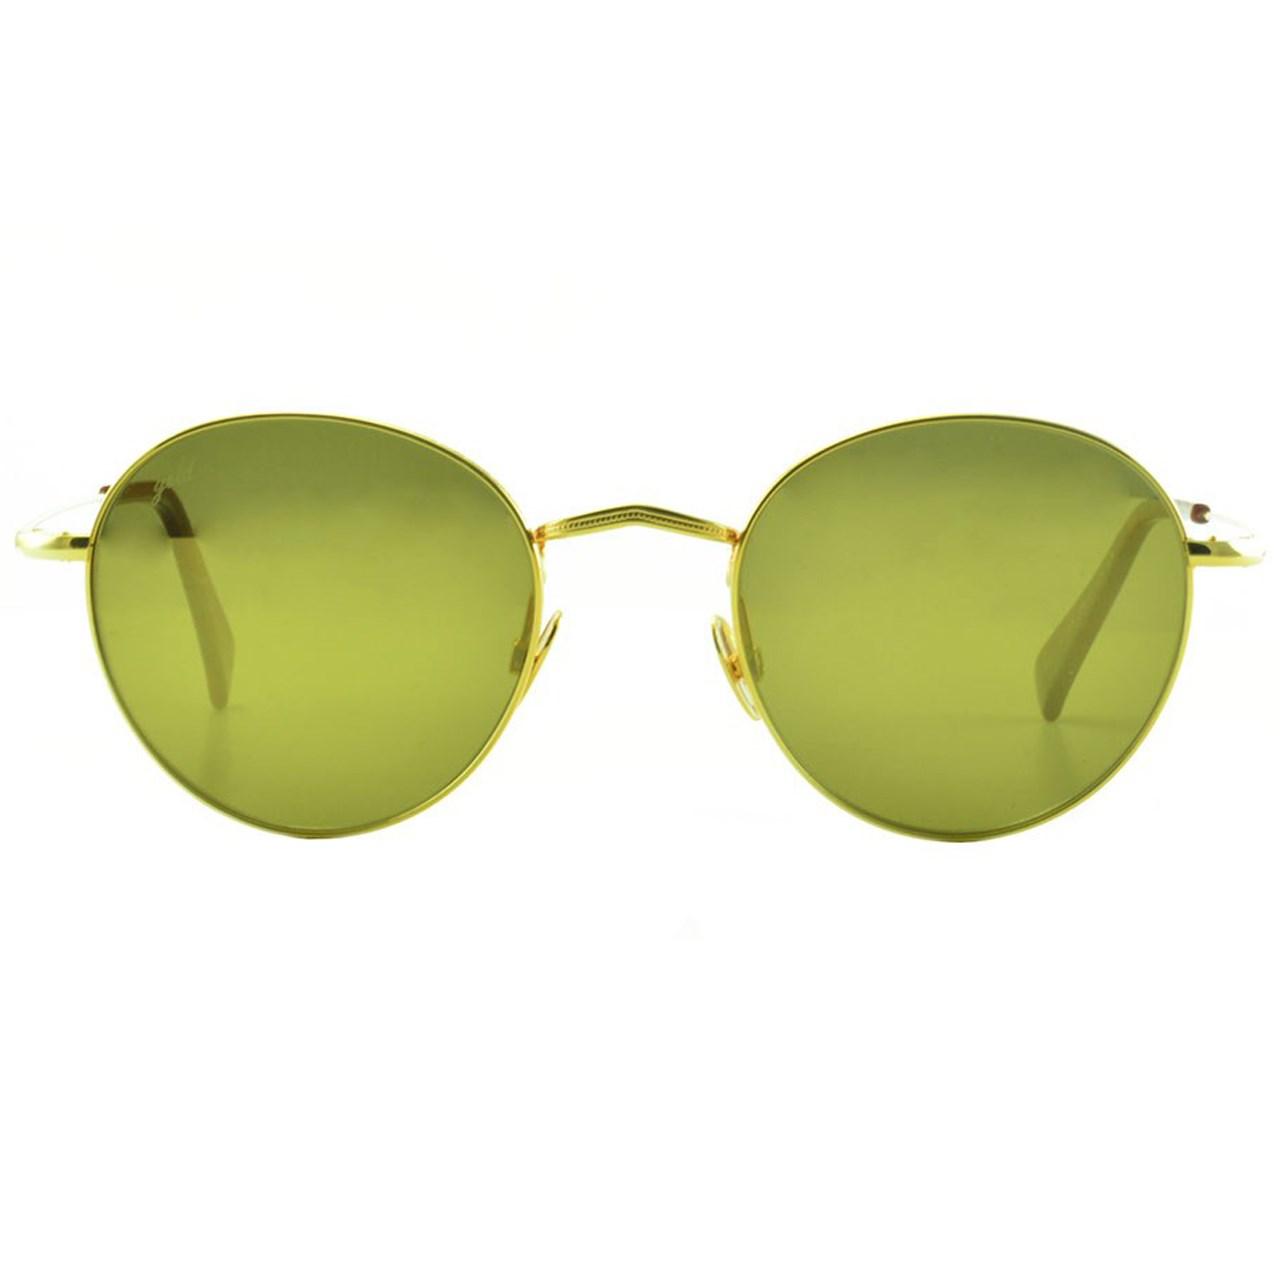 عینک آفتابی Nik03 سری Gold مدل Nk1118 Rgp